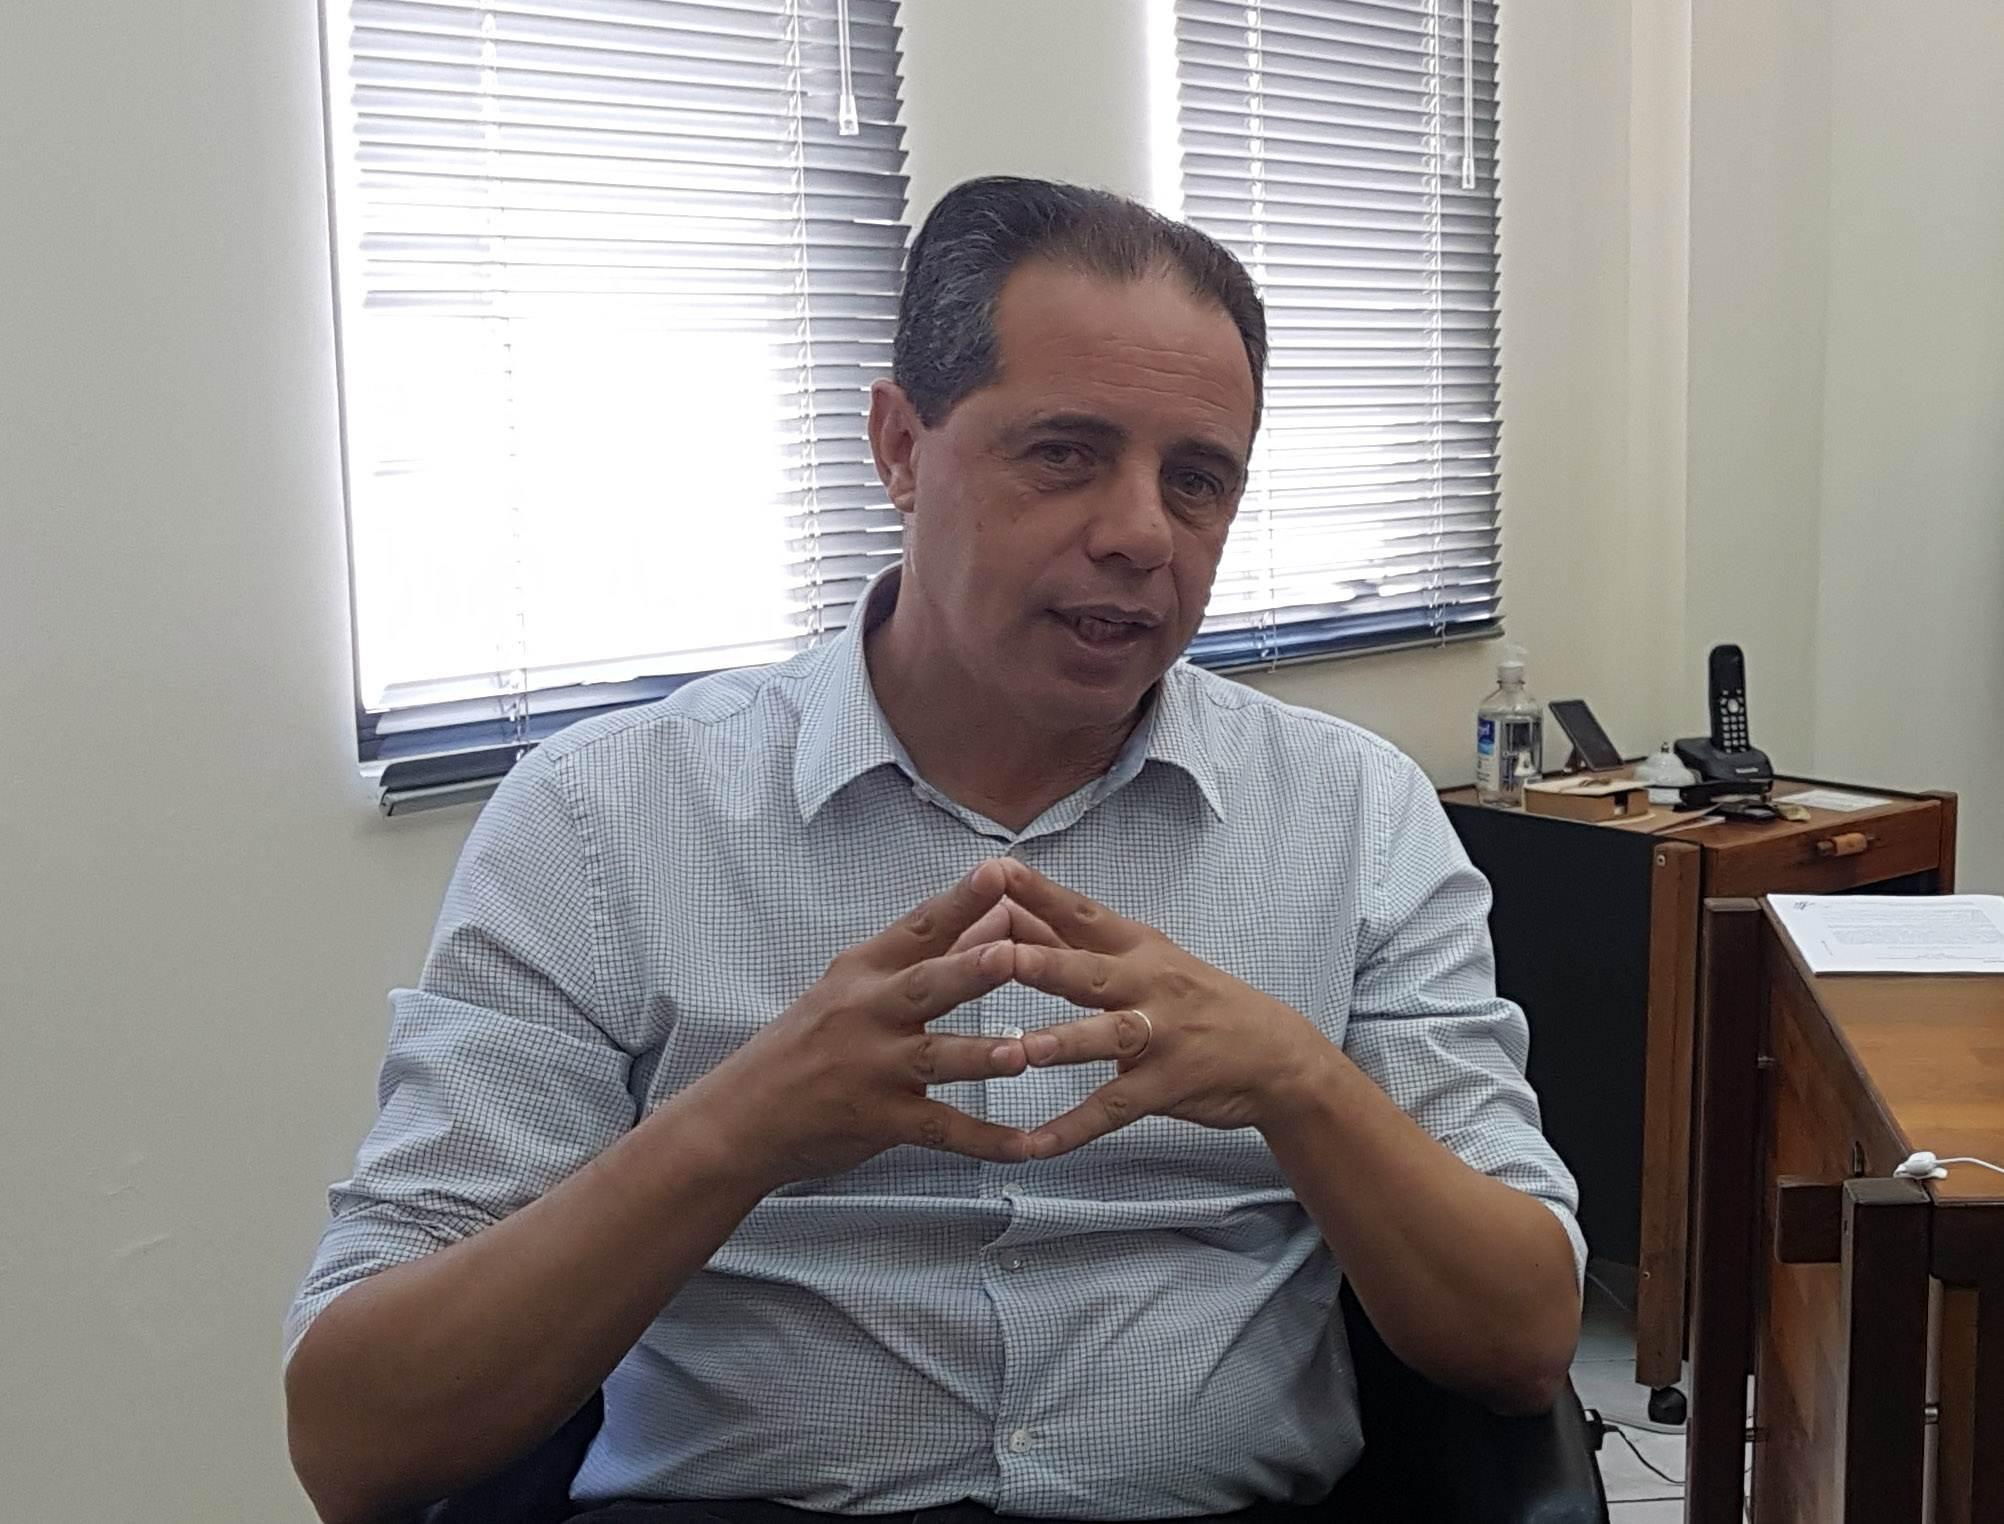 José Carlos Palma falou ao Folha Z sobre disputa da presidência da Fecomércio | Foto: Valdemy Teixeira